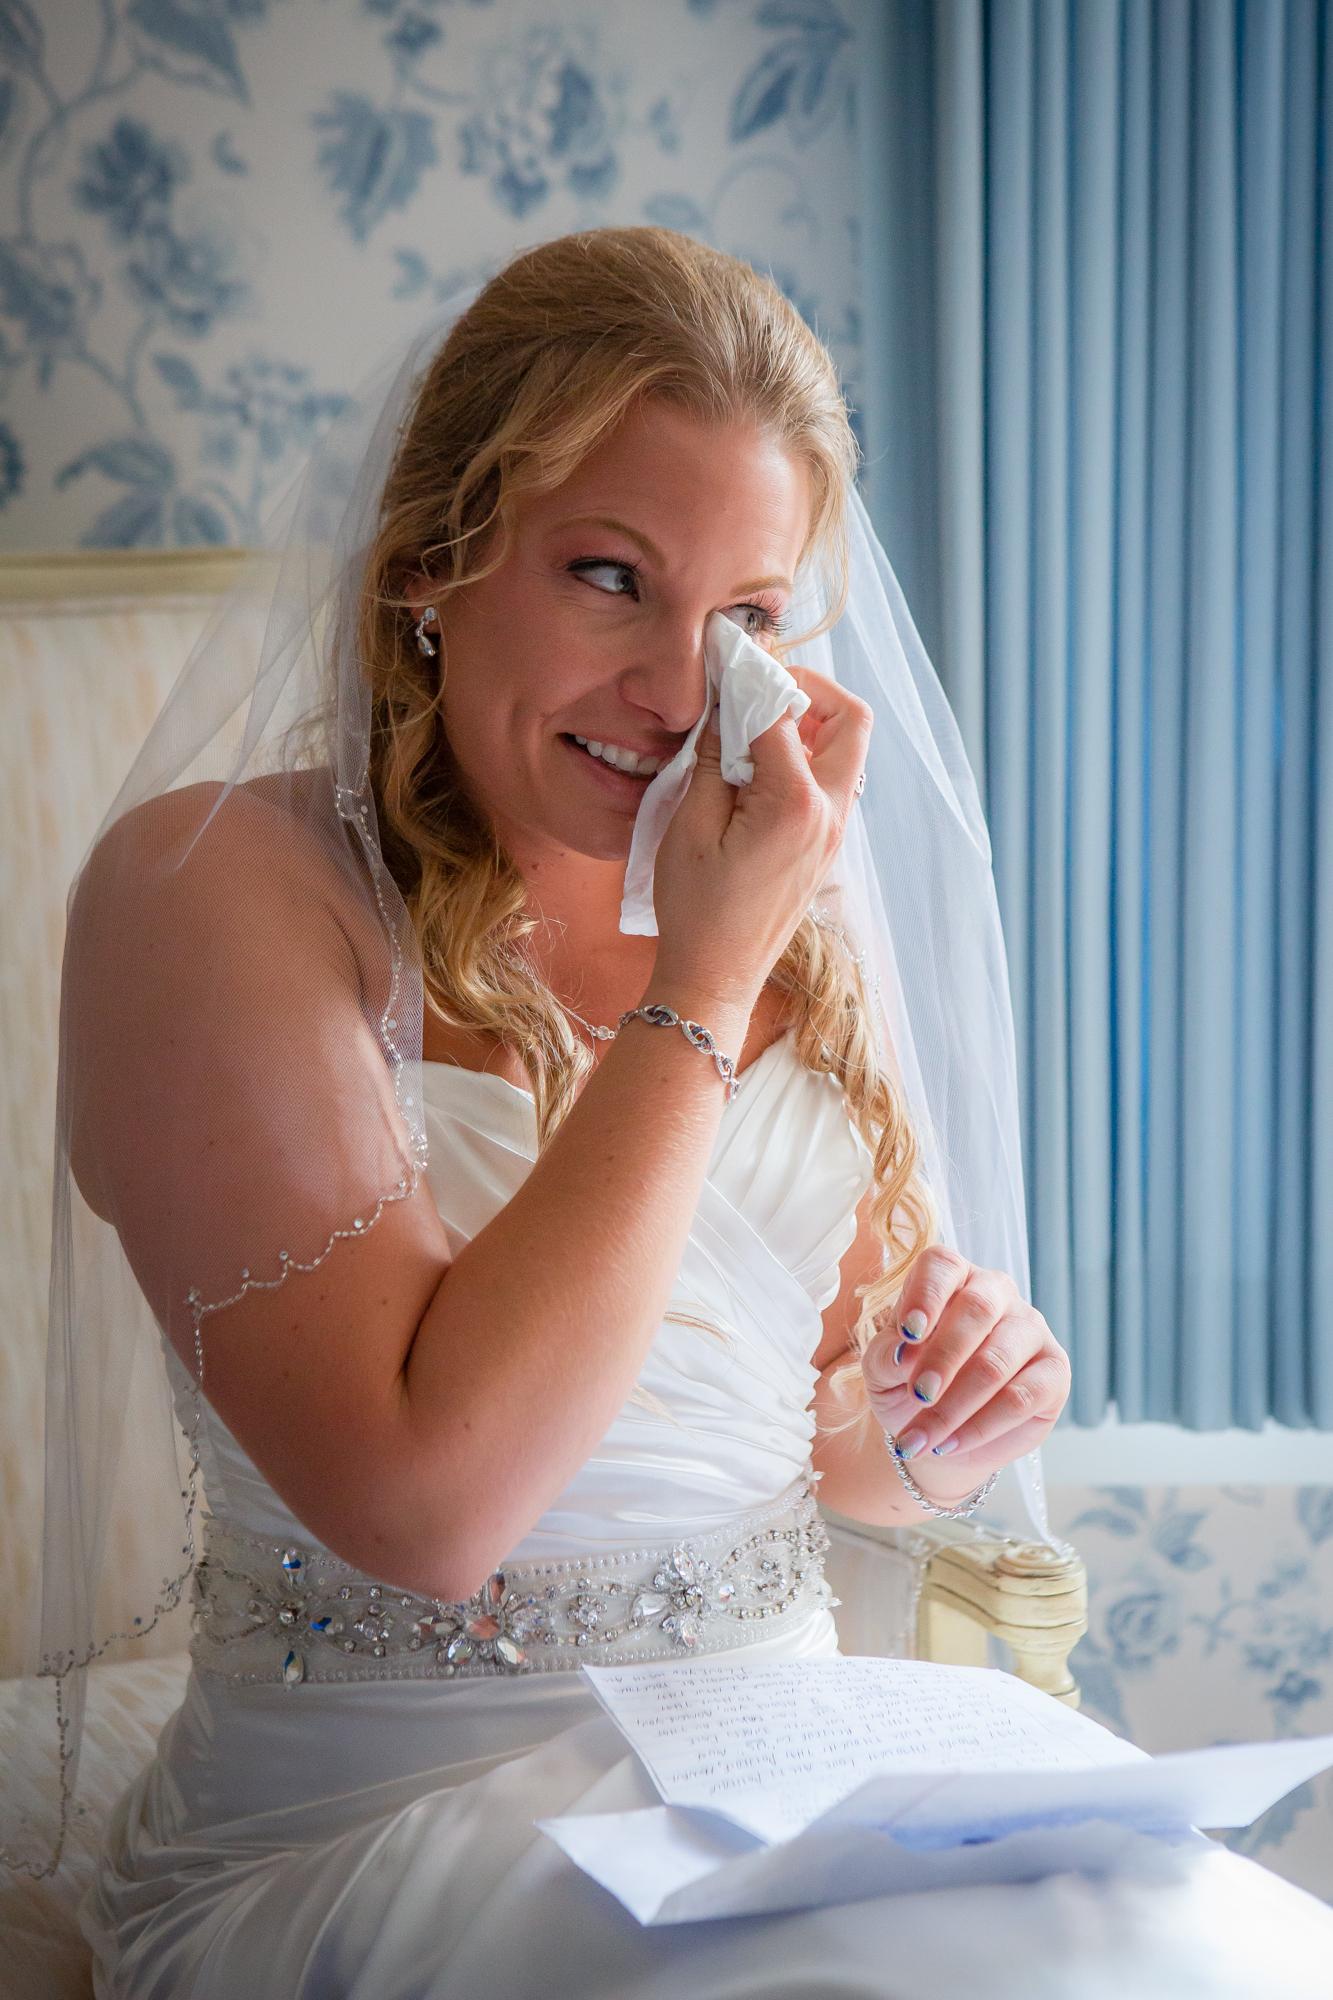 Raddison-Hotel-Corning-NY-Wedding-3744.jpg